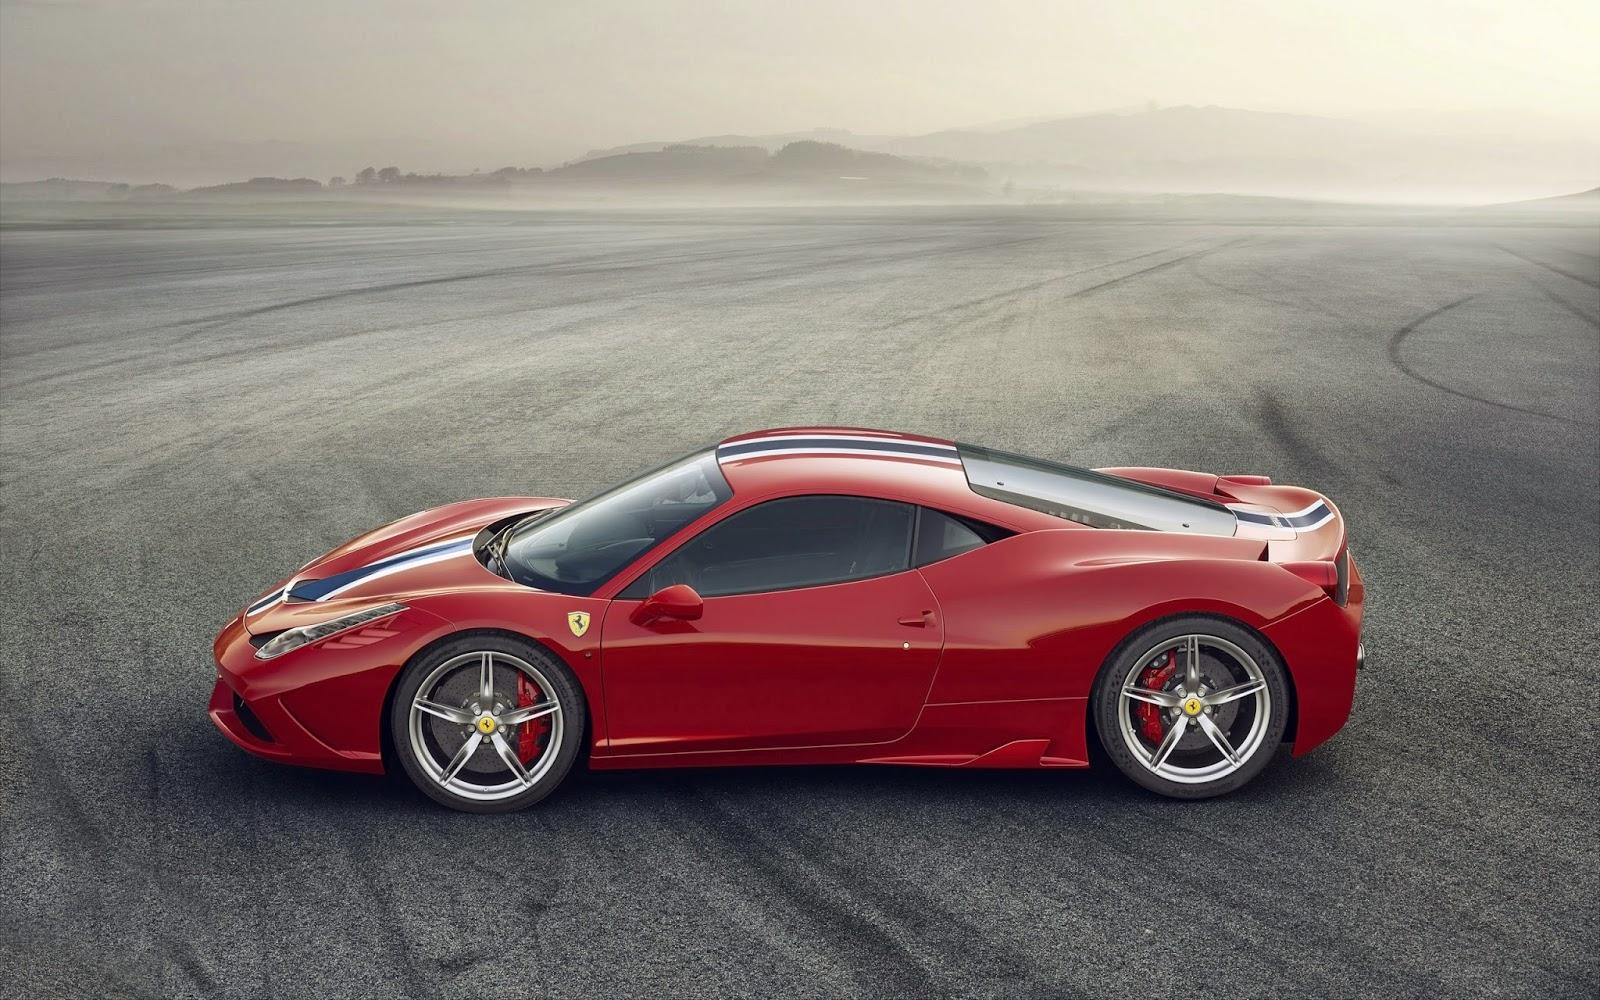 "<img src=""http://1.bp.blogspot.com/-GLOVciBAleg/UynNRlvpldI/AAAAAAAALHg/Cj5Re3elMZo/s1600/ferrari-red-car.jpg"" alt=""Ferrari Wallpapers"" />"